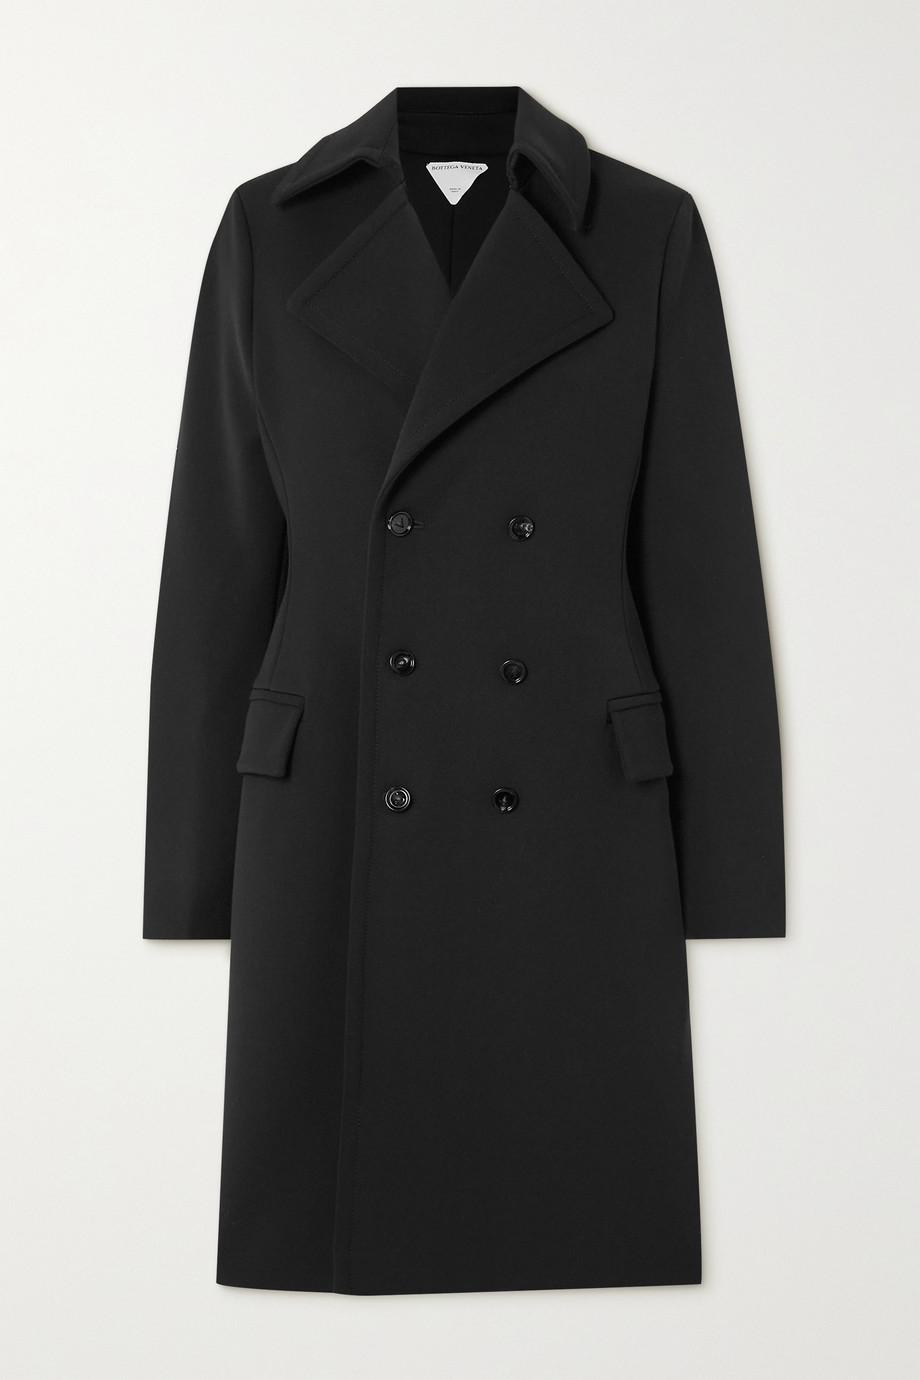 Bottega Veneta Double-breasted wool-blend coat